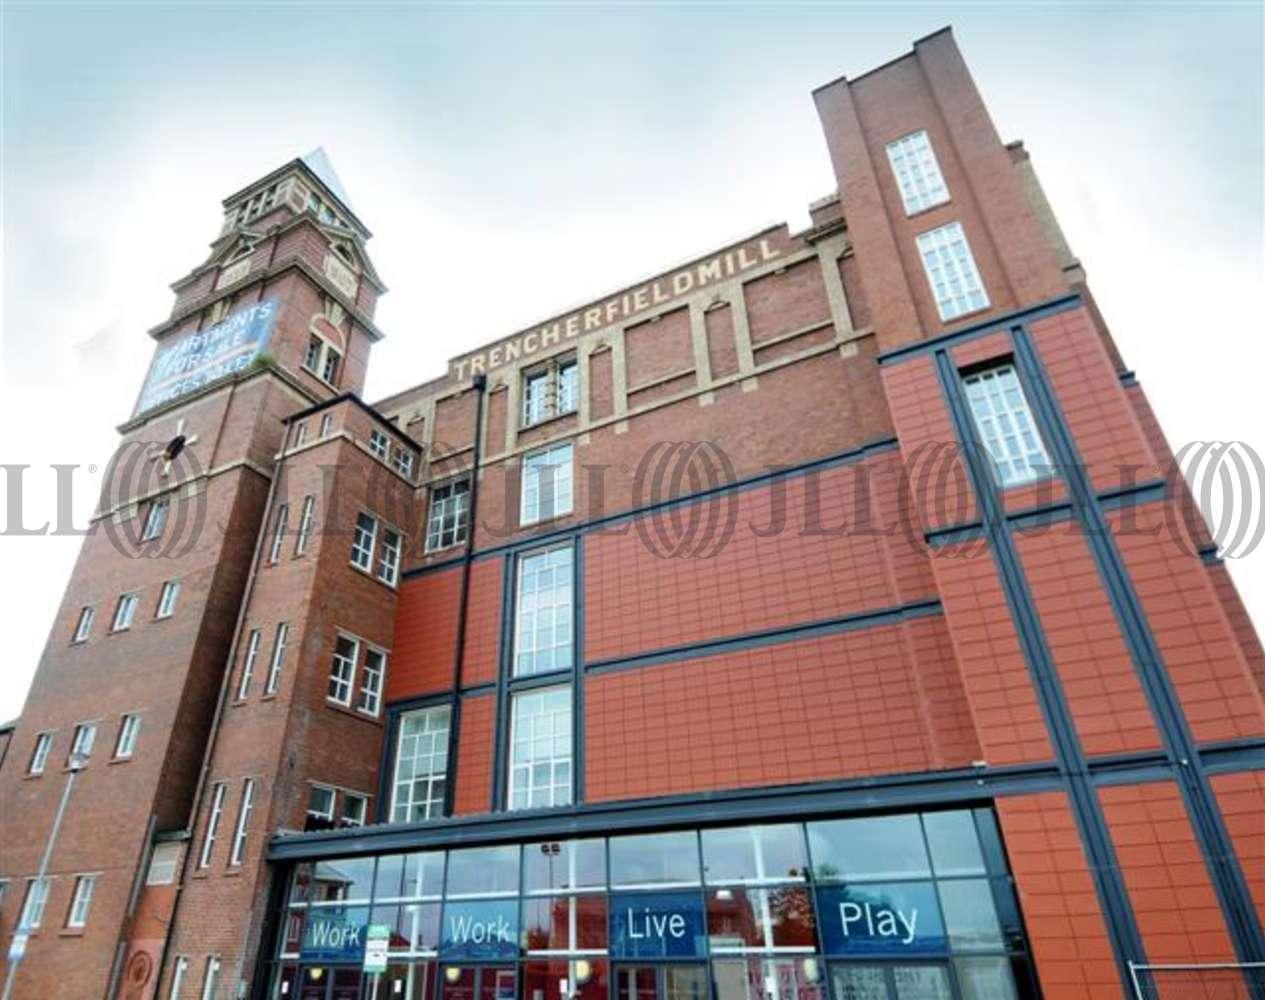 Office Wigan, WN3 4DU - Trencherfield Mill - 249982